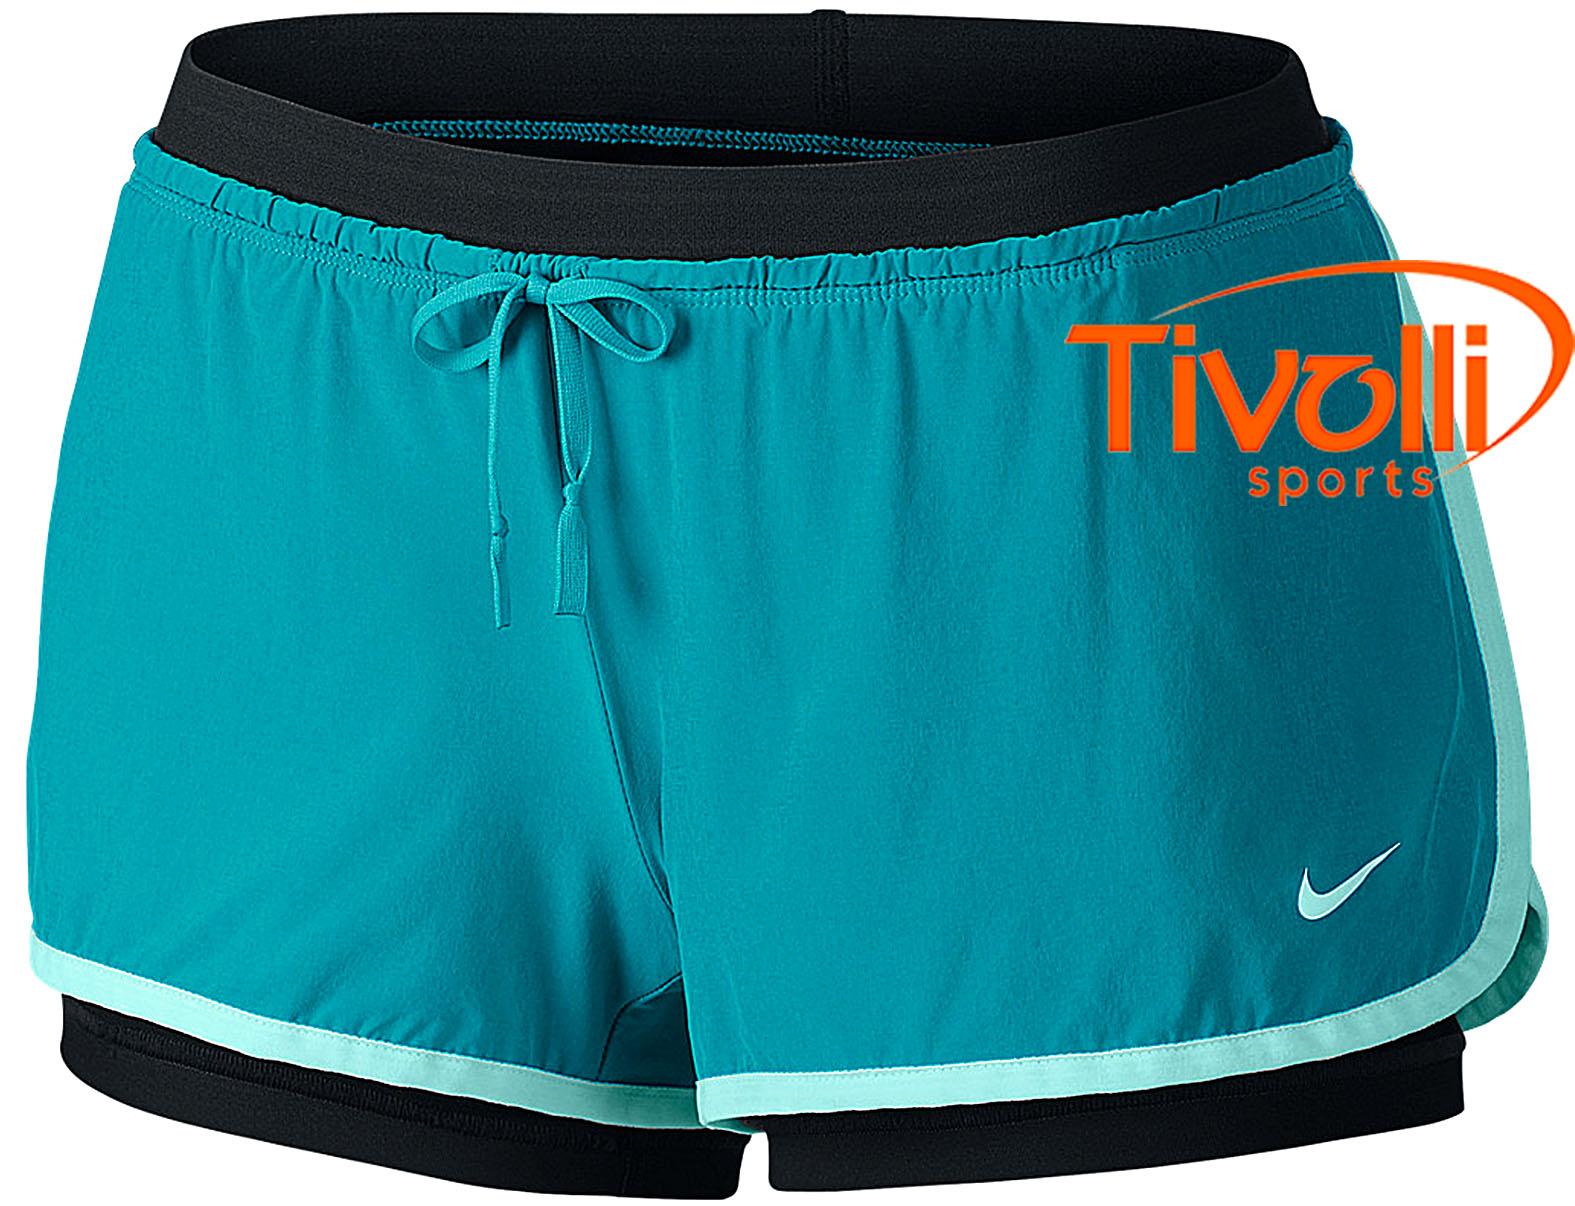 291579fc2cbf1 Raquete Mania   Shorts Nike 2 em 1 Full Flex   feminino azul e preto